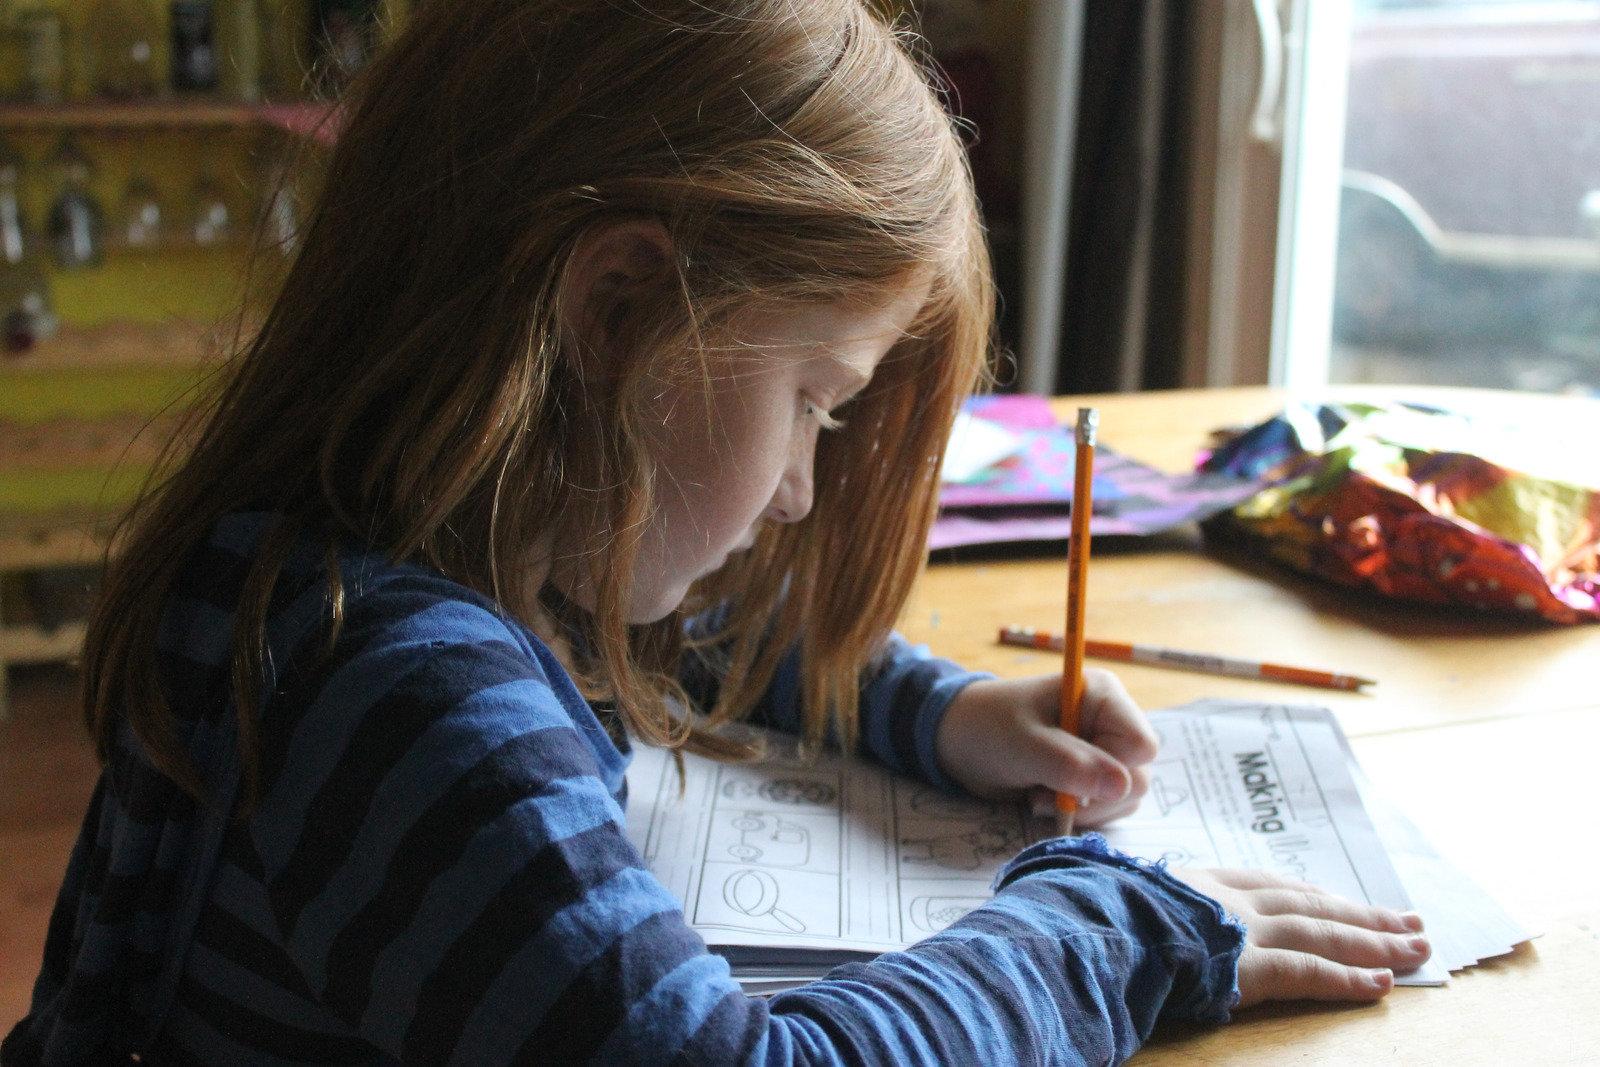 Children's After School Care